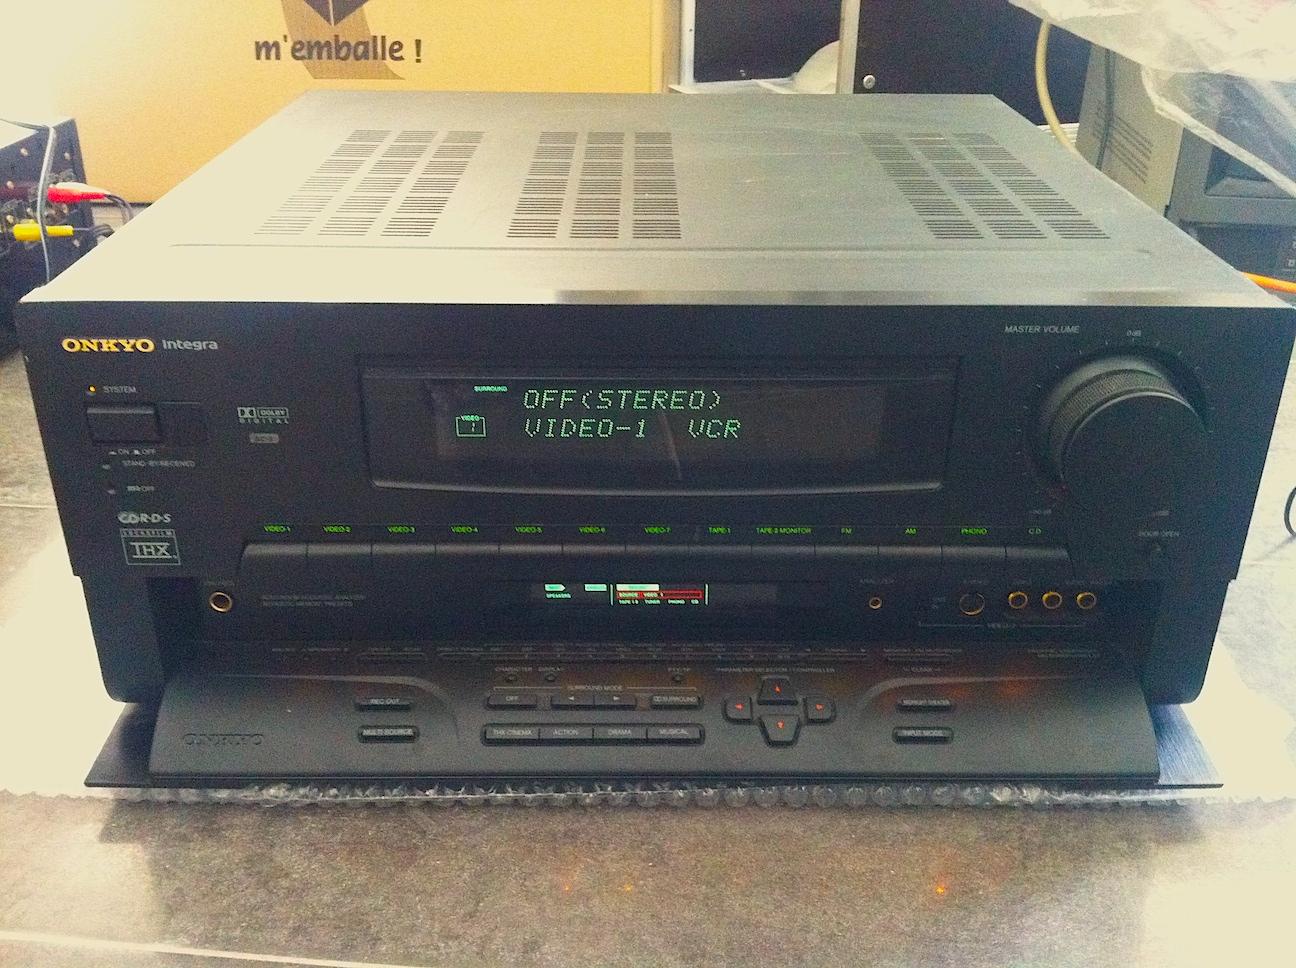 onkyo tx ds939 image 1053702 audiofanzine rh en audiofanzine com onkyo tx-ds939 manual onkyo integra tx-ds939 service manual